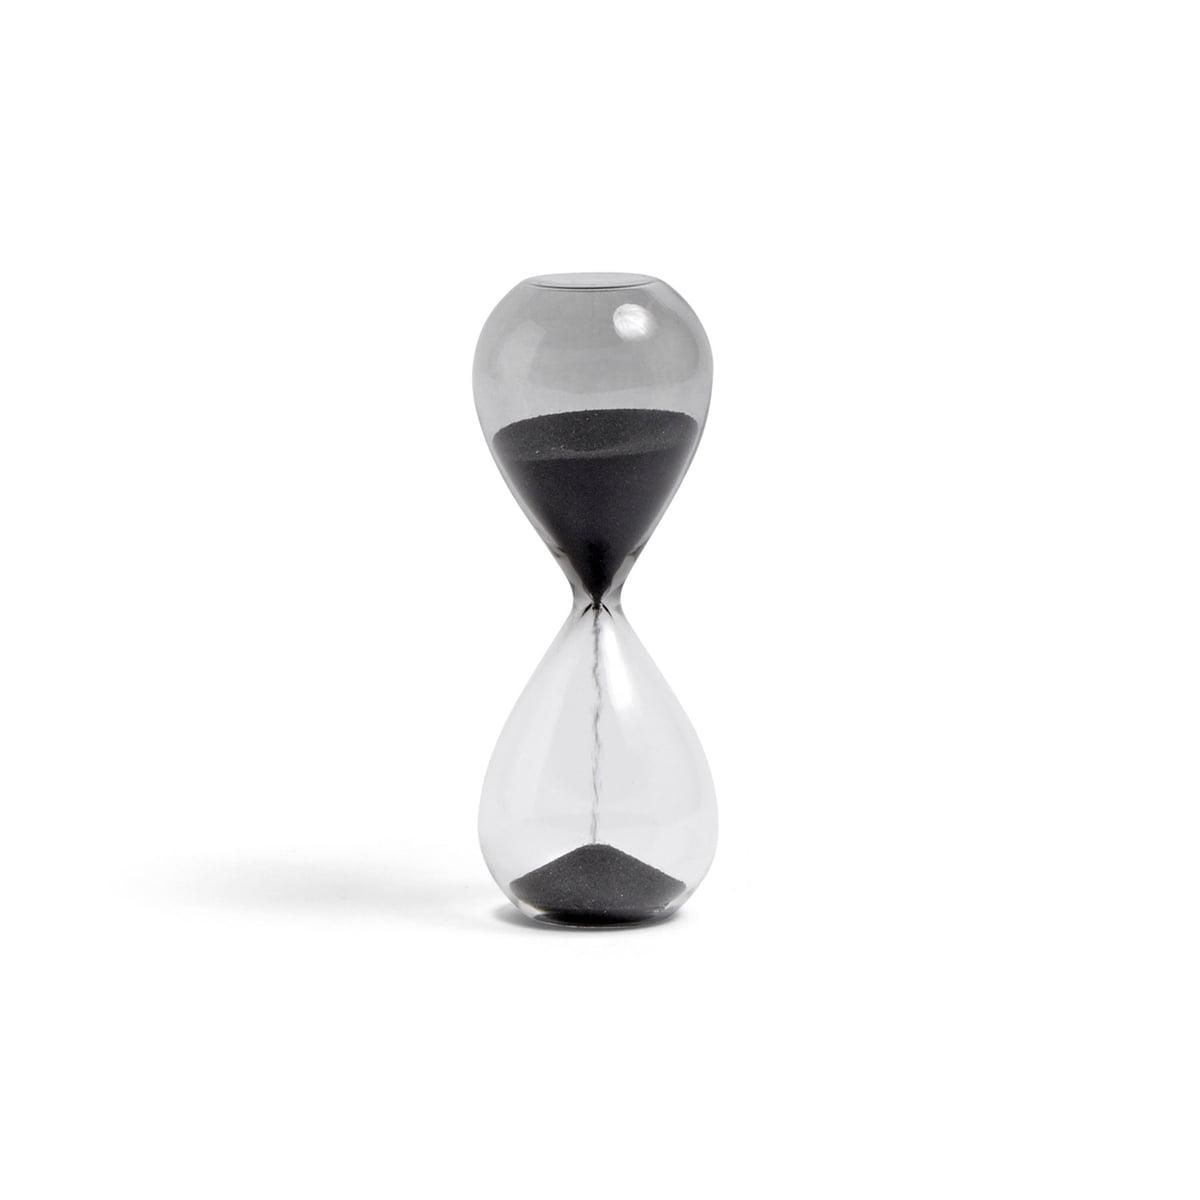 HAY - Time Sanduhr S, schwarz (2019)